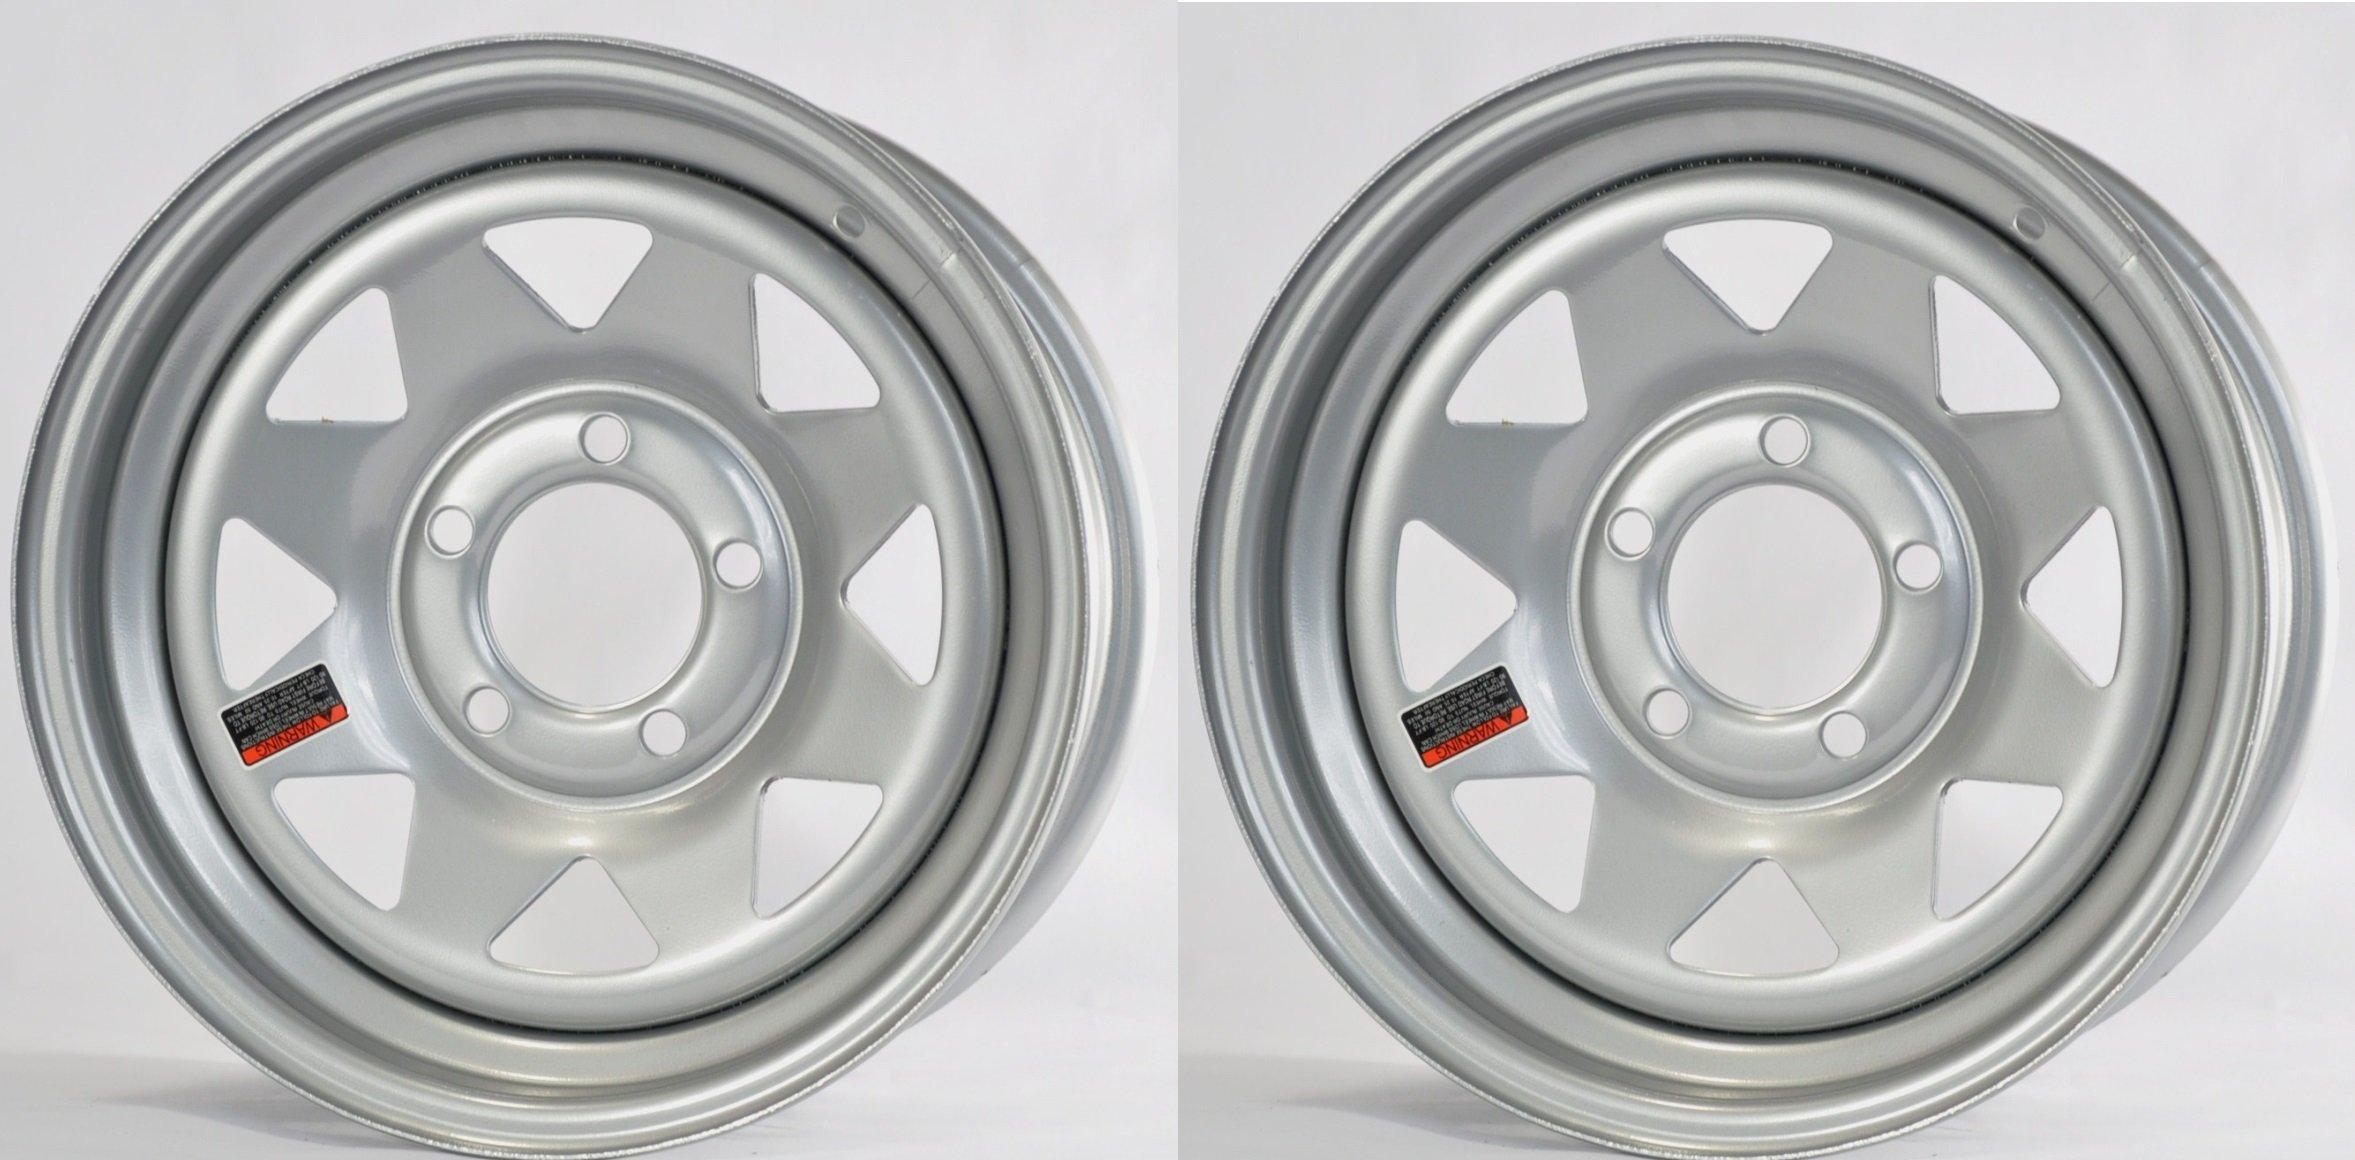 eCustomRim 2-Pack Trailer Wheel Silver Rims 14 x 5.5 Spoke Style (5 Lug On 4.5'' Center)